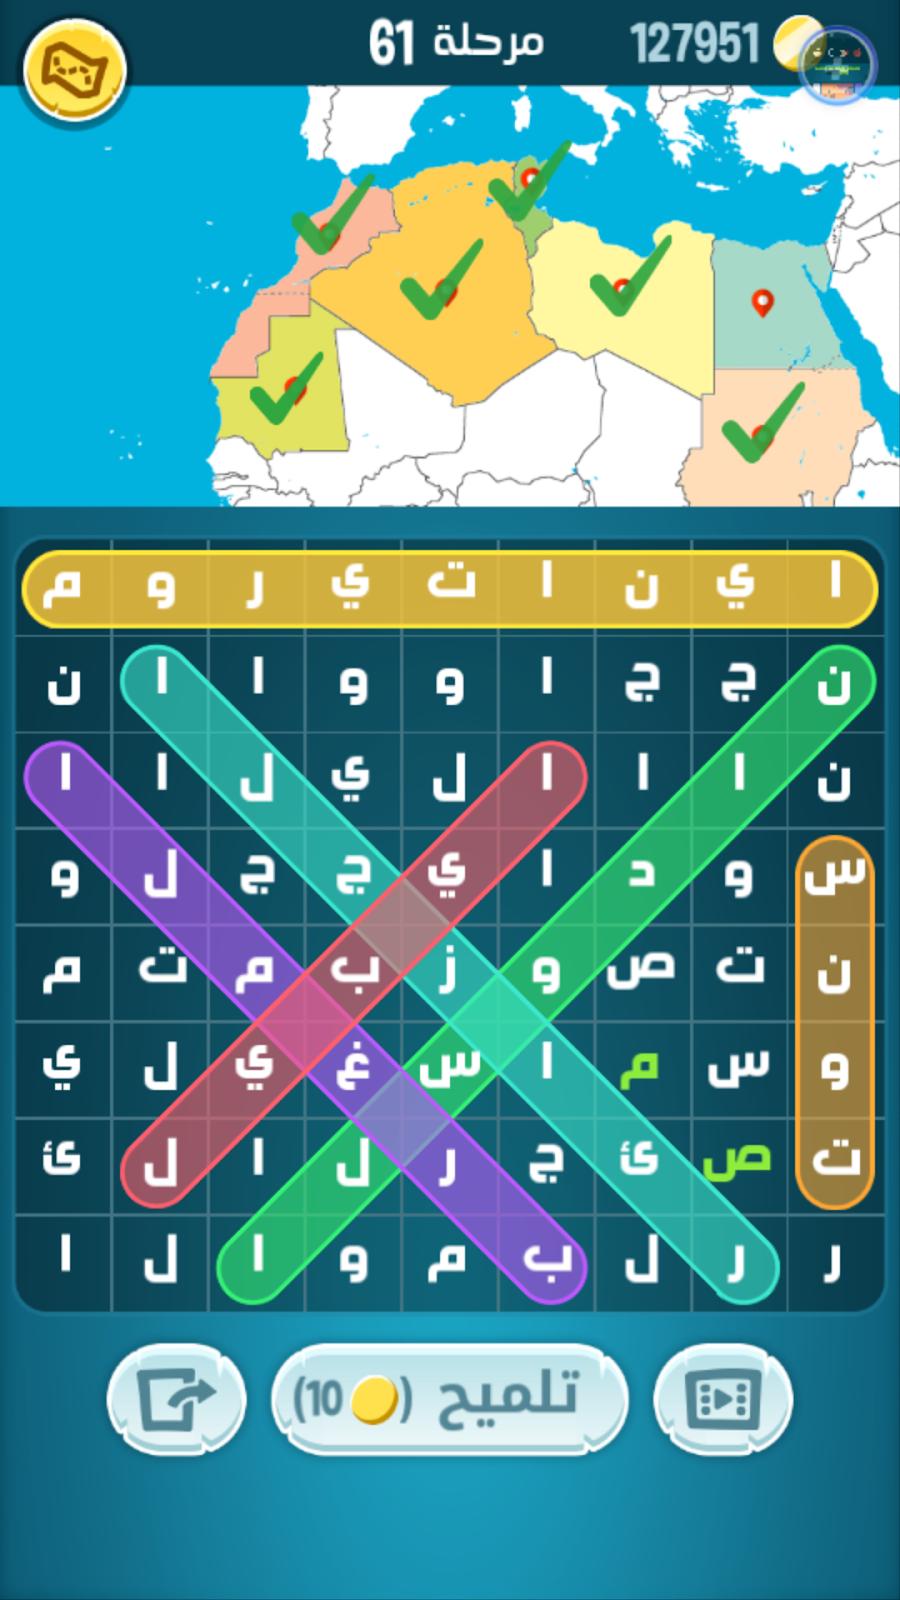 090ba5bd1 حل كلمات كراش من زيتونة تسلية وتحدي من مرحلة 121 الى مرحلة 140 ...